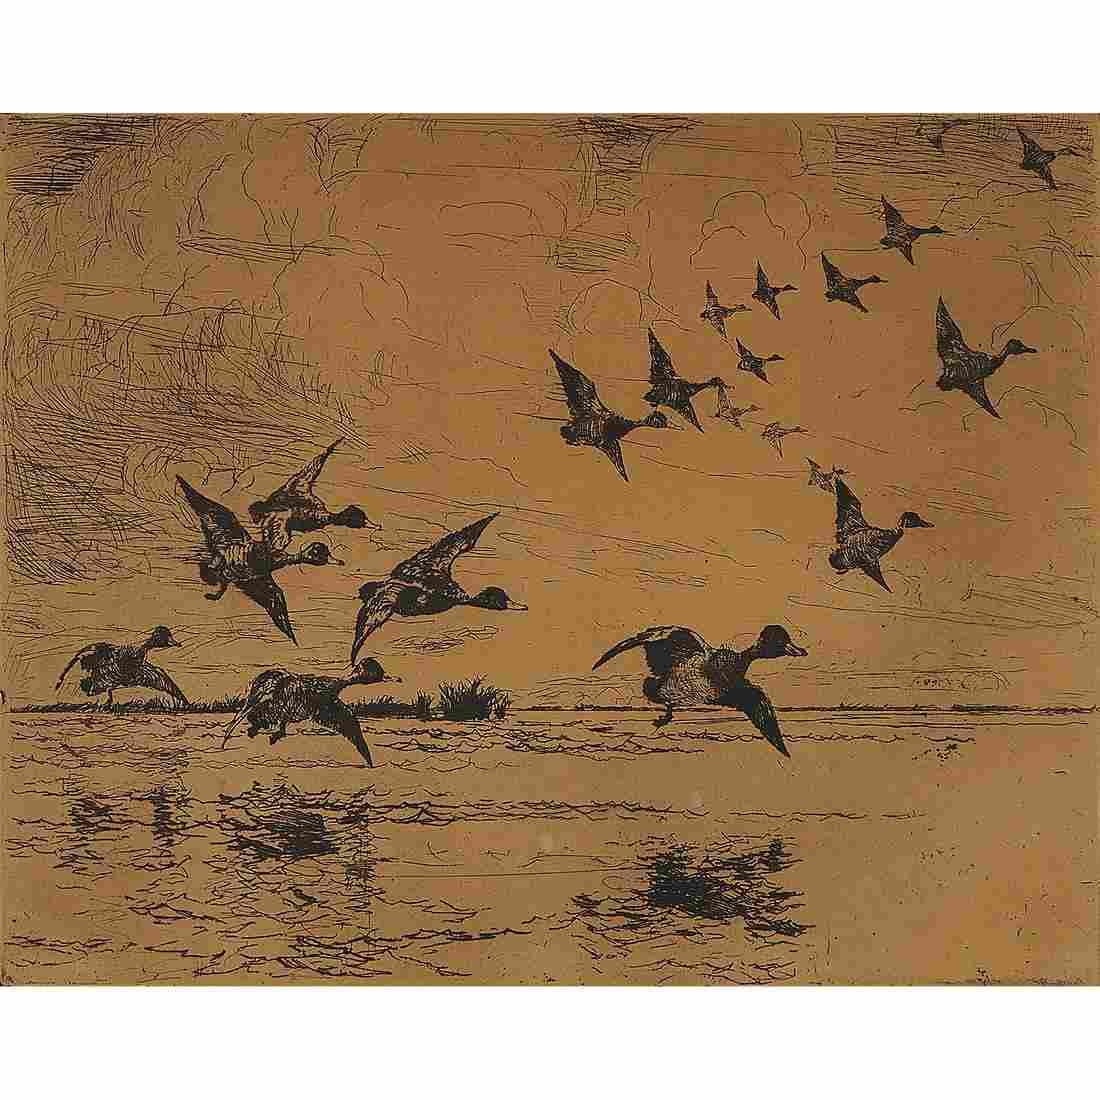 Frank Weston Benson, Ducks over Water, etching